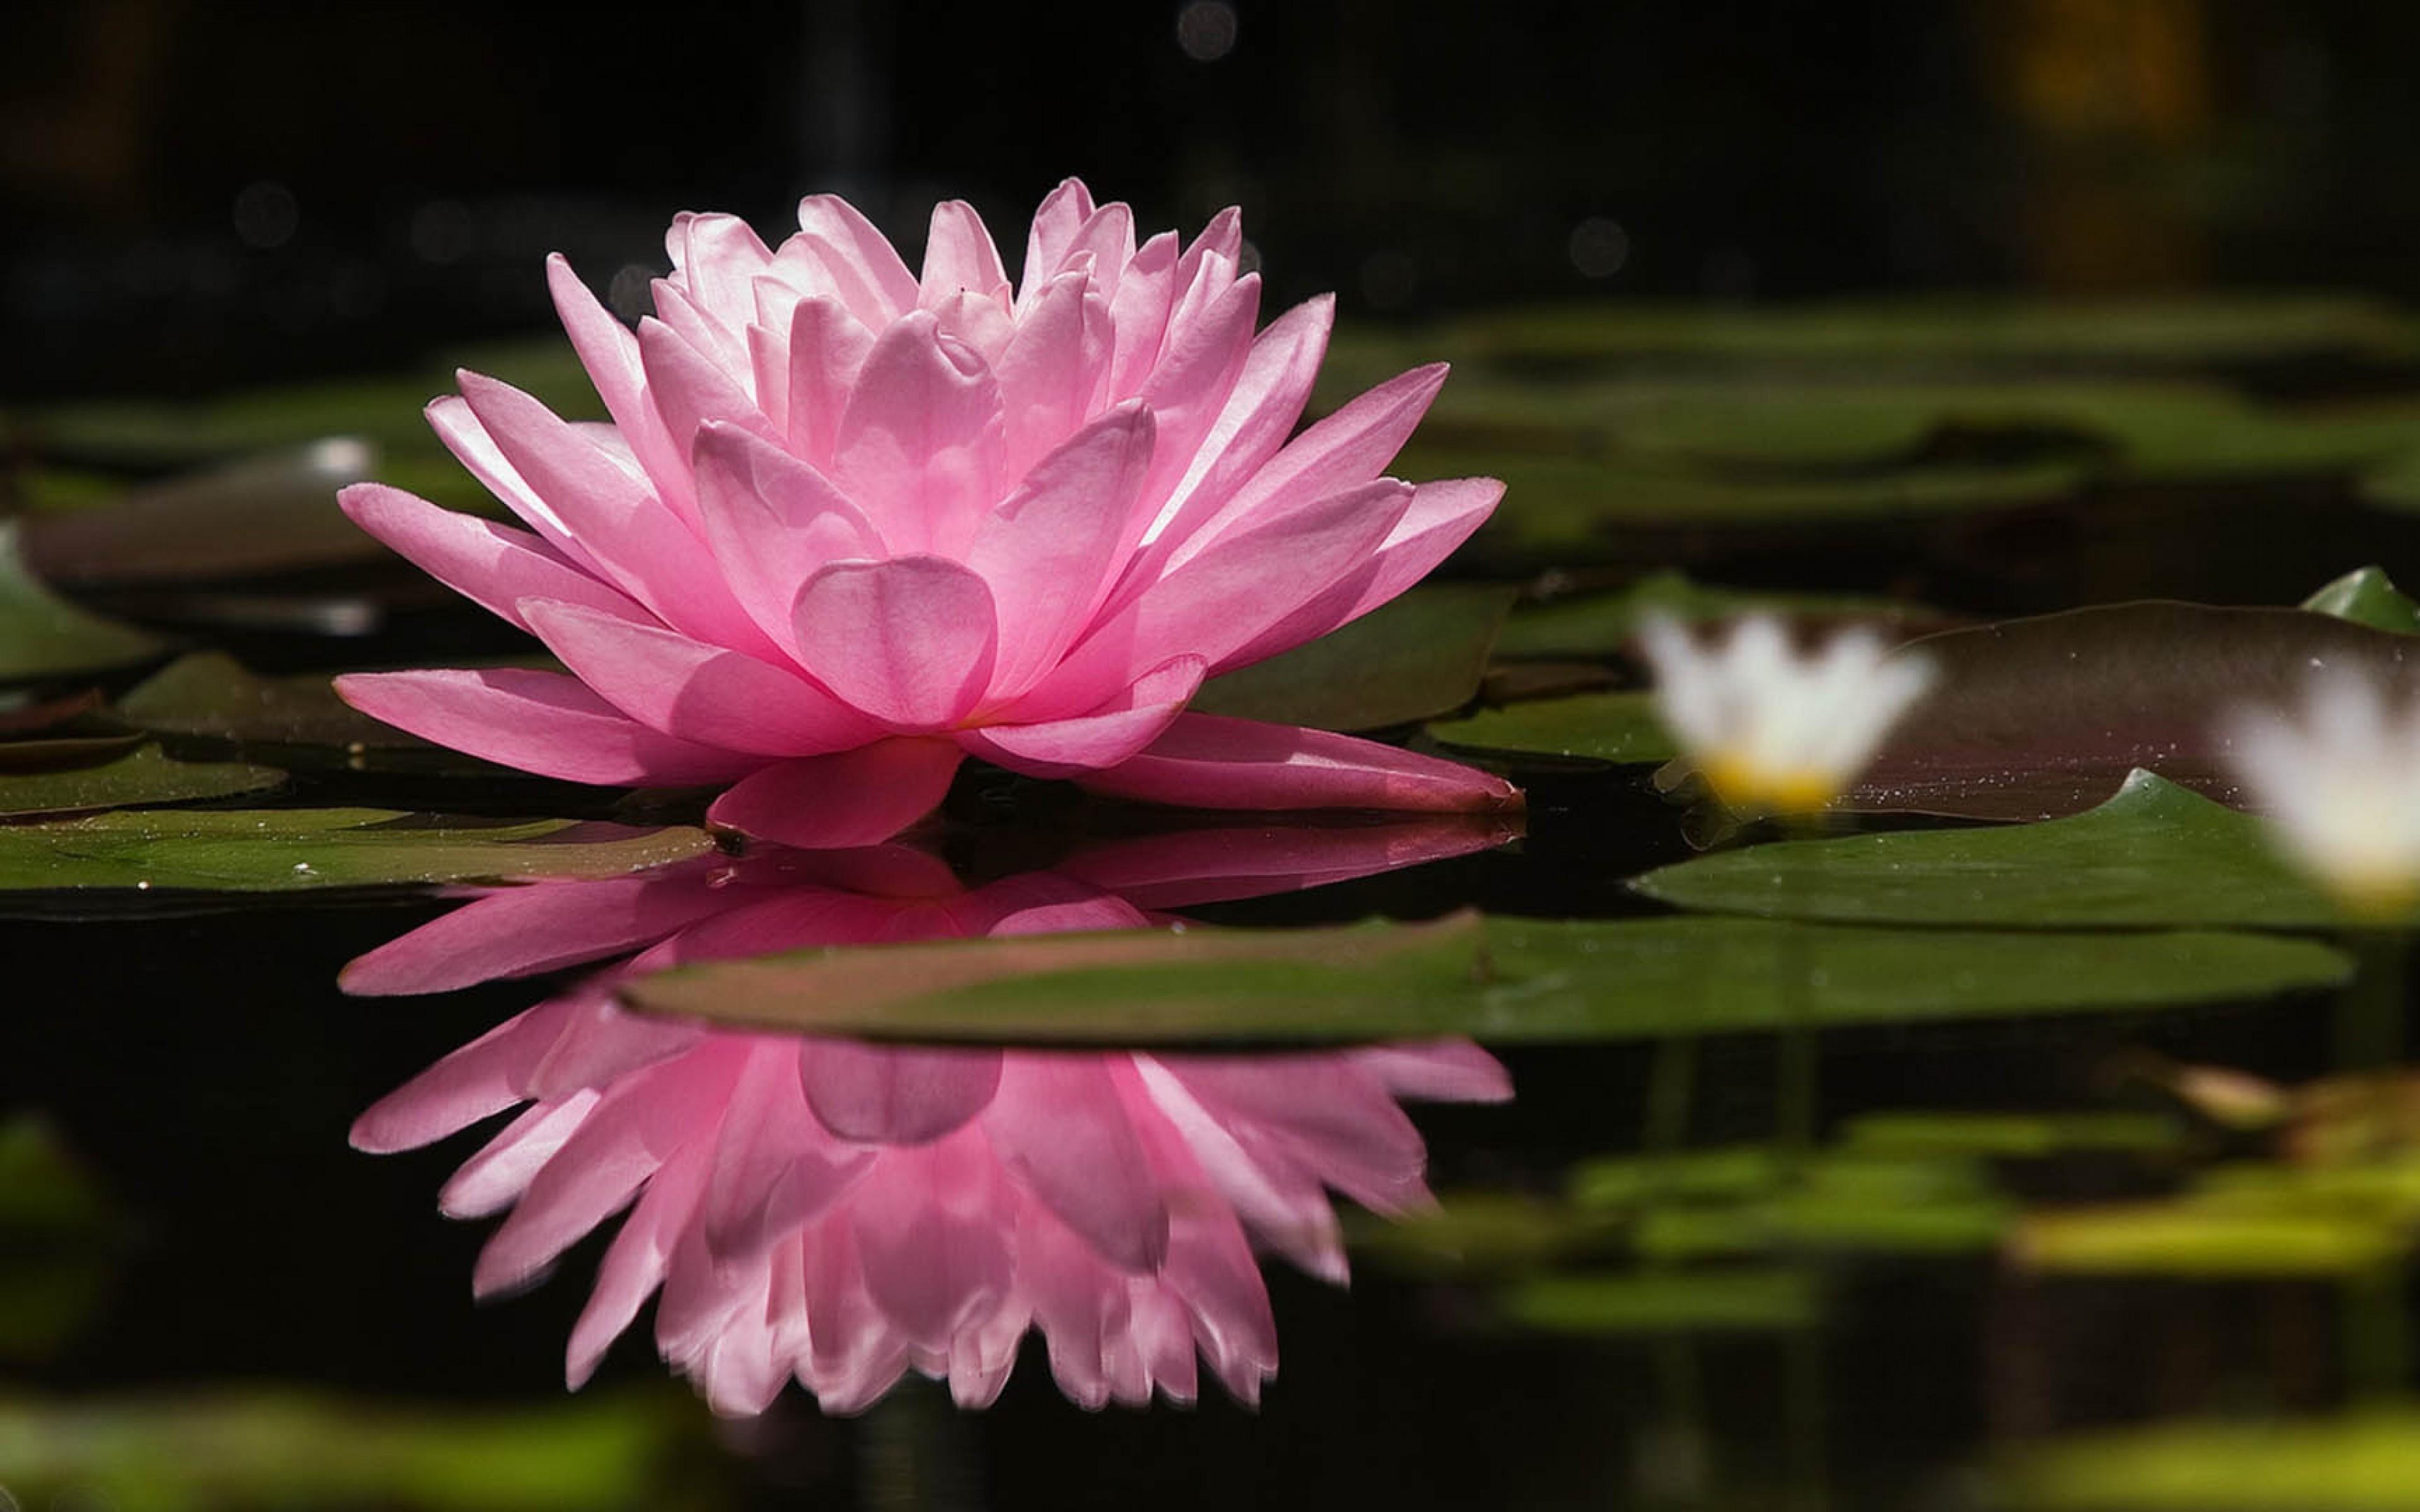 Wallpaper Nature Blossom Pink Lotus Flowers Lotus Flower